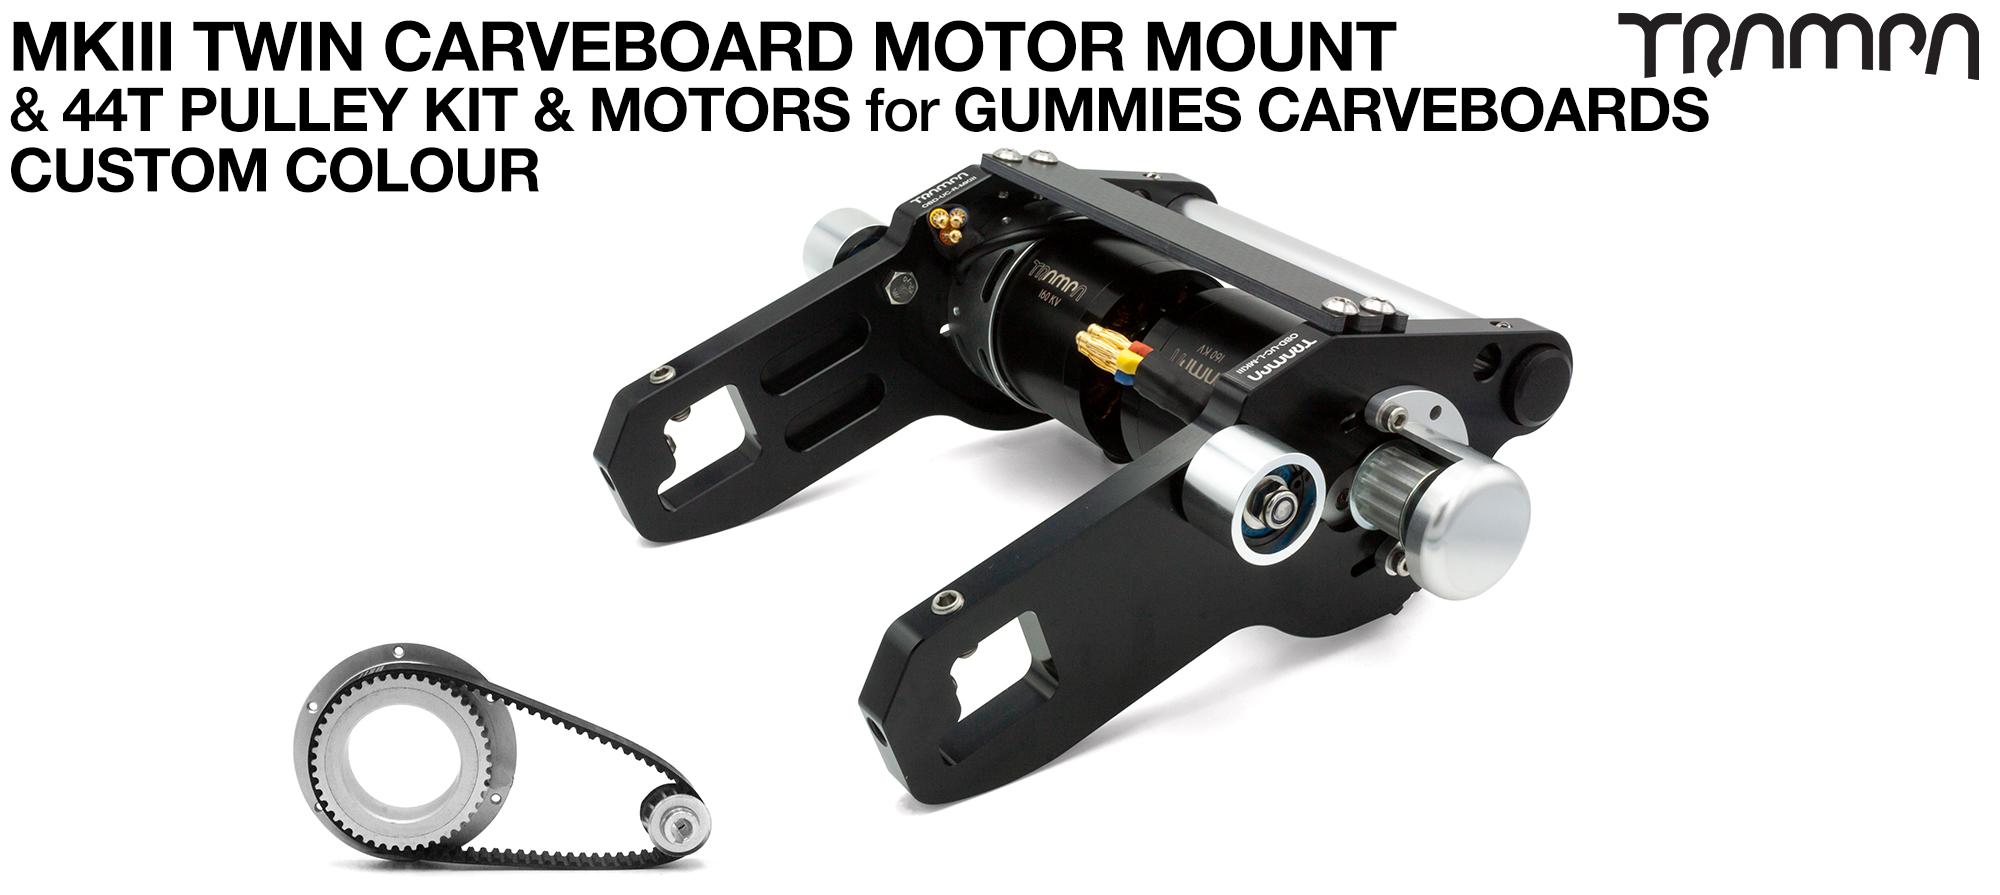 MkIII GUMMIES CARVEBOARD Motormount Connector Panel & 44 Tooth Pulley Kit & Motor - TWIN